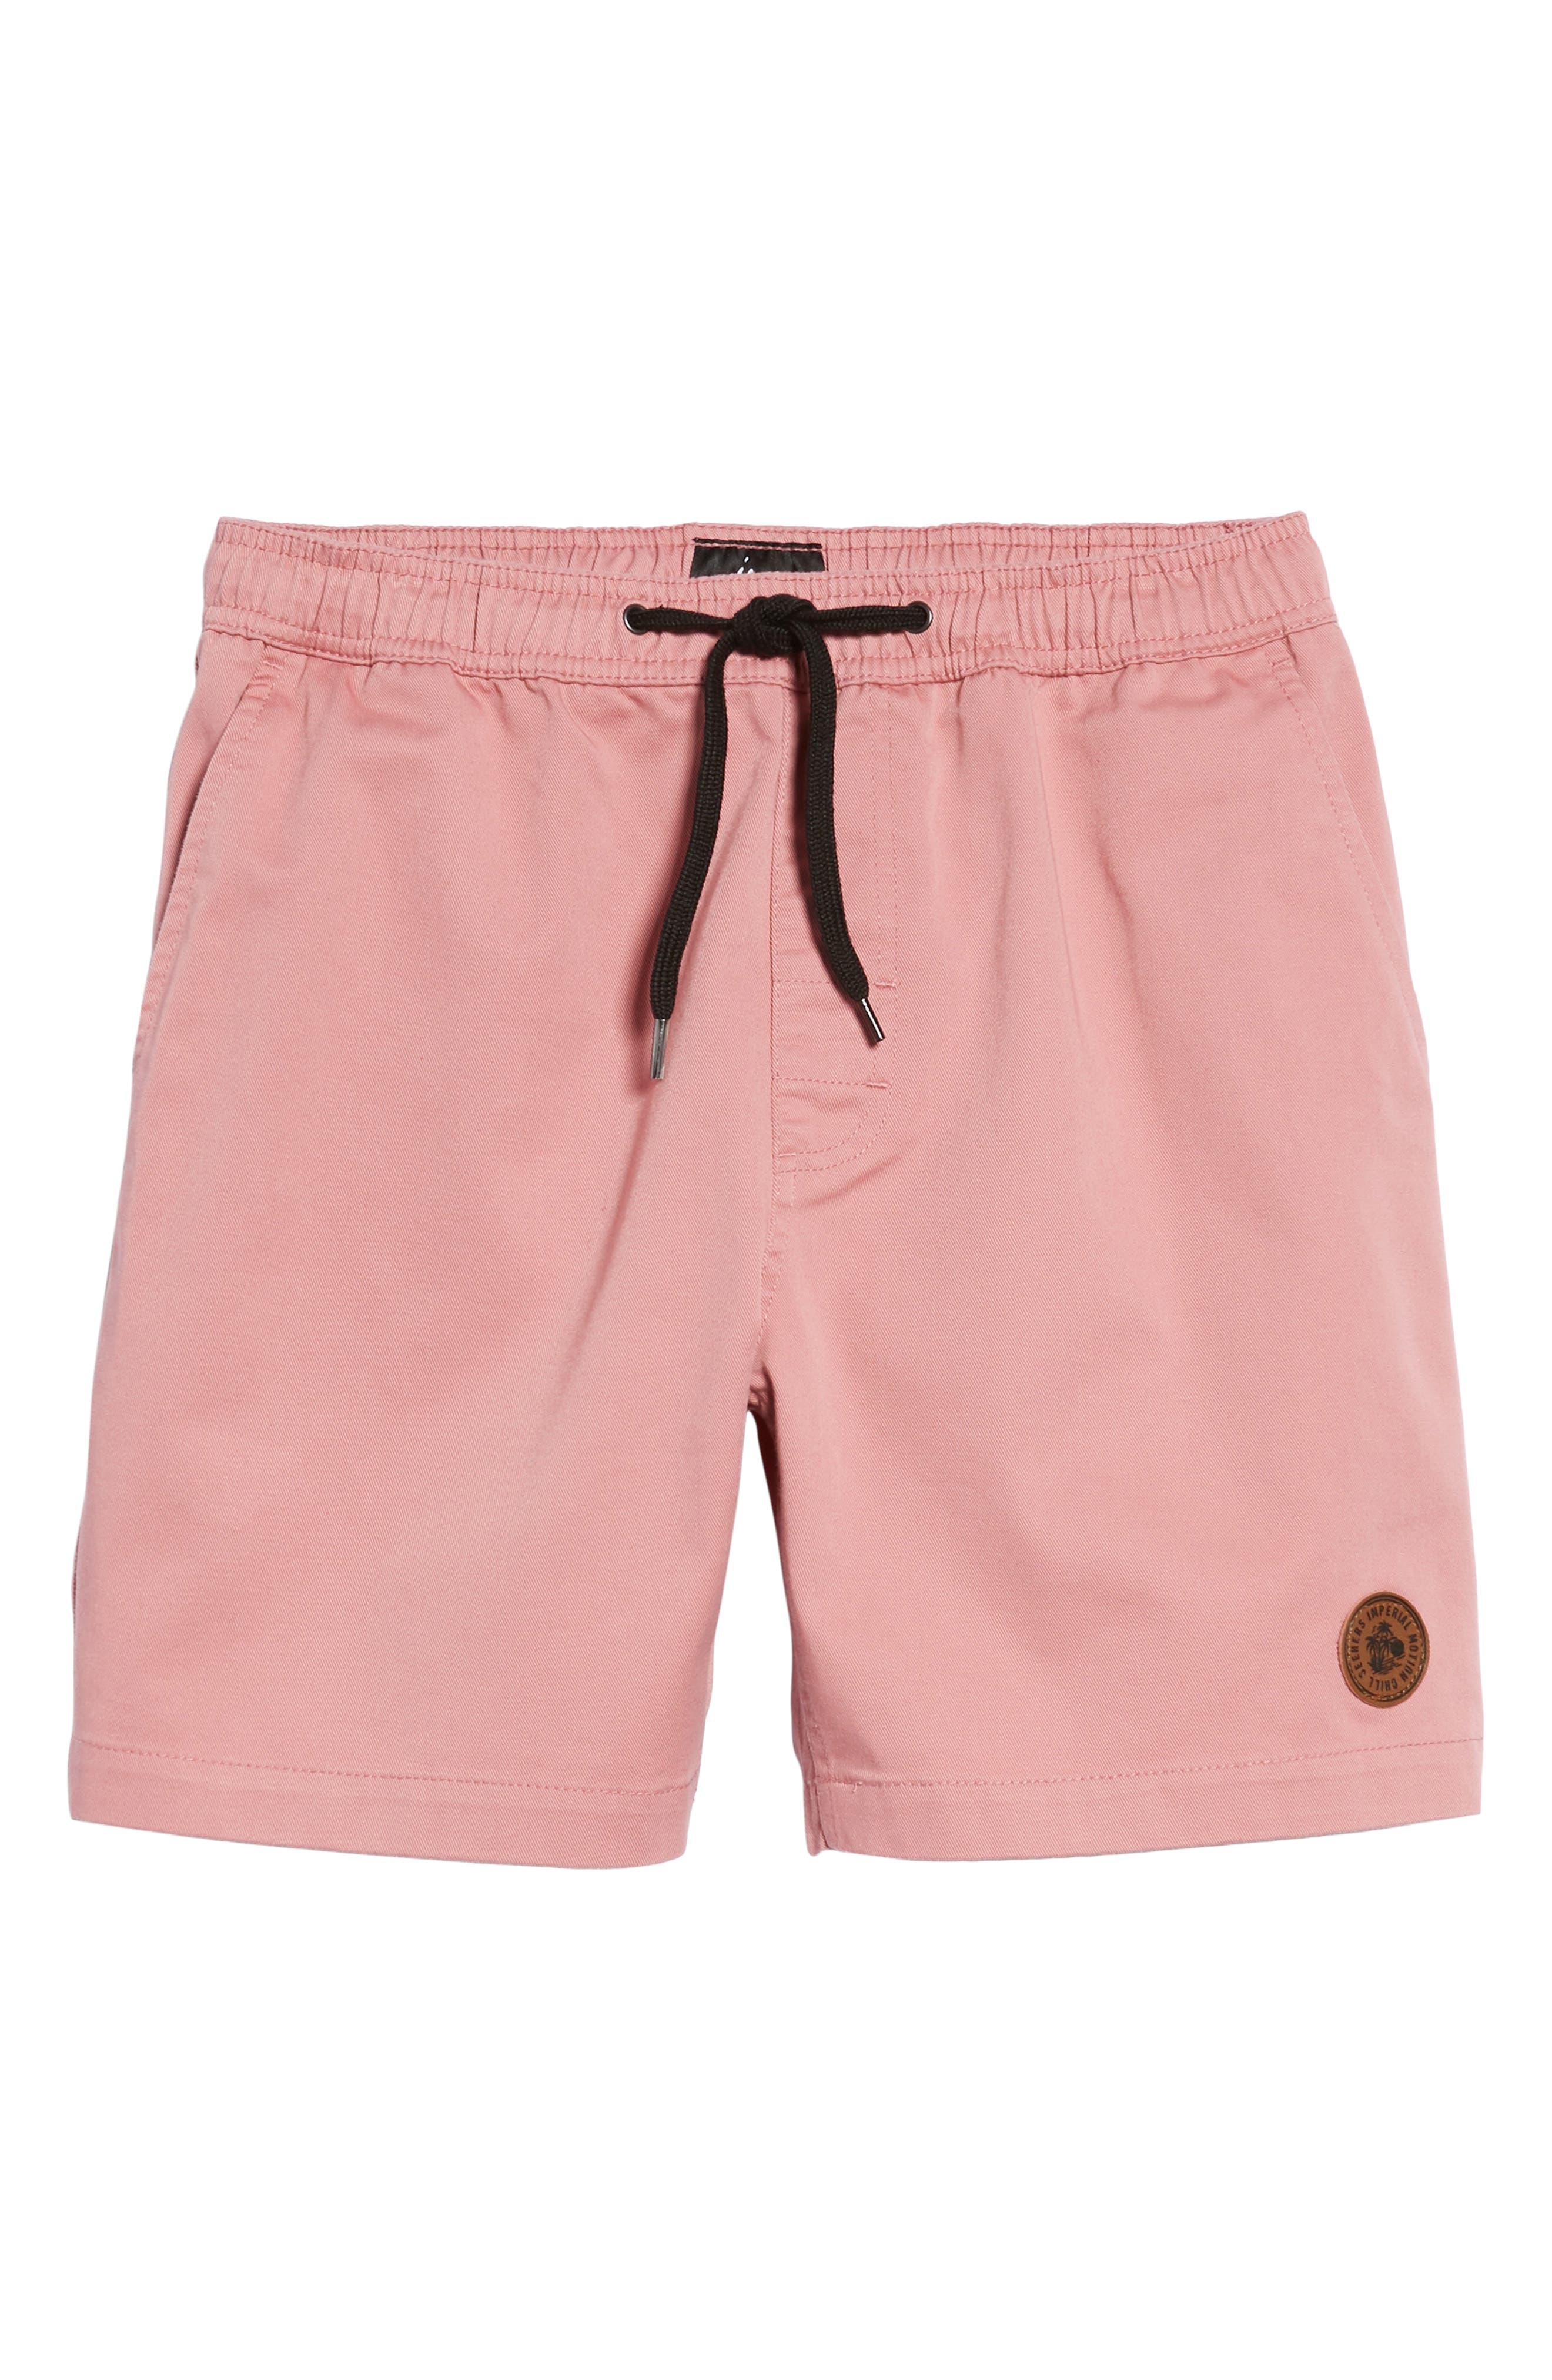 Seeker Shorts,                             Alternate thumbnail 6, color,                             650